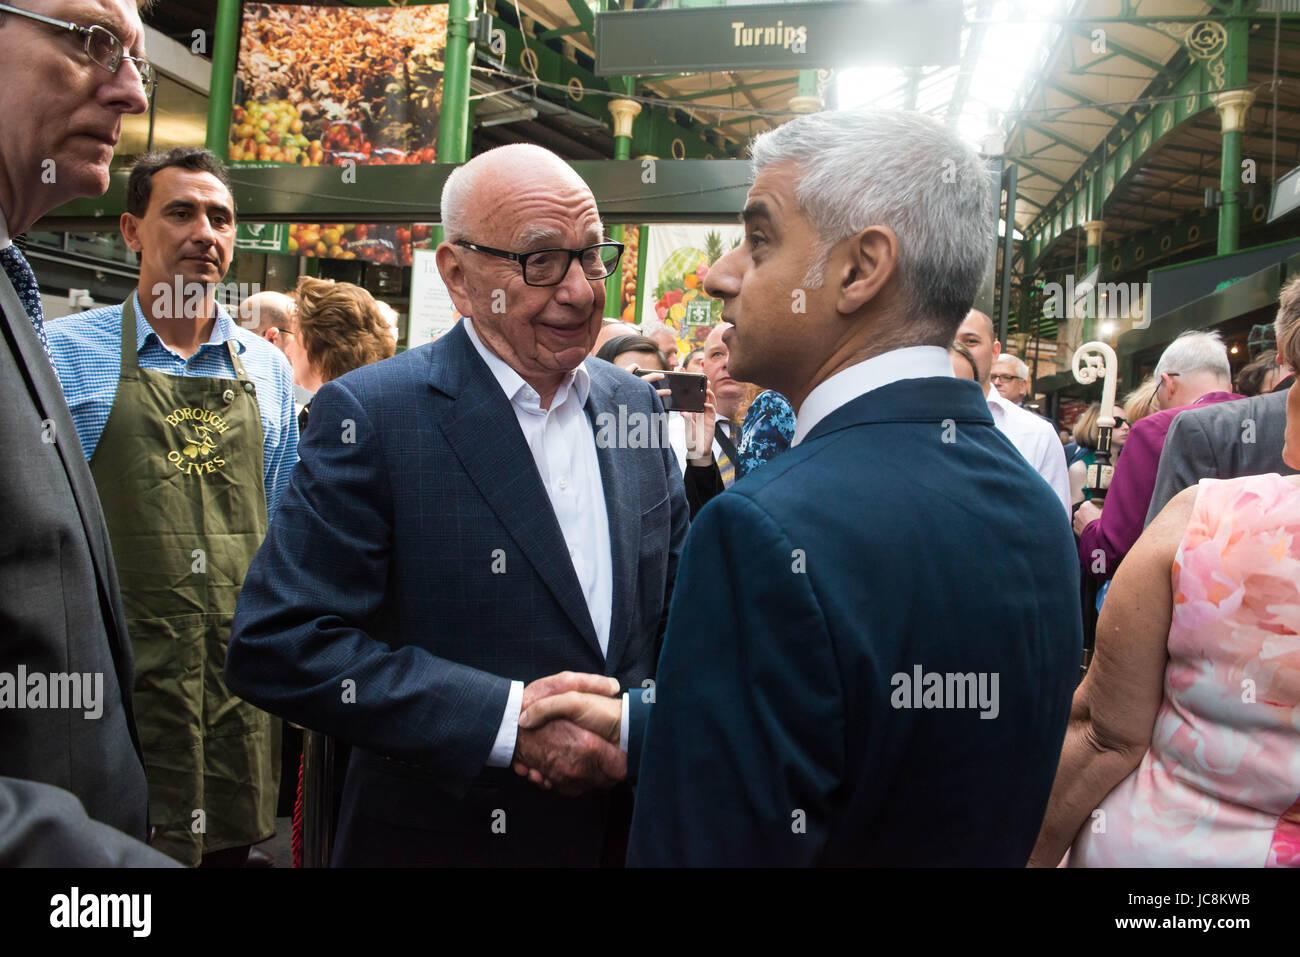 London, UK. 14th June, 2017. London Mayor Sadiq Khan speaks to Rupert Murdoch at Borough Market as it re-opens Borough - Stock Image